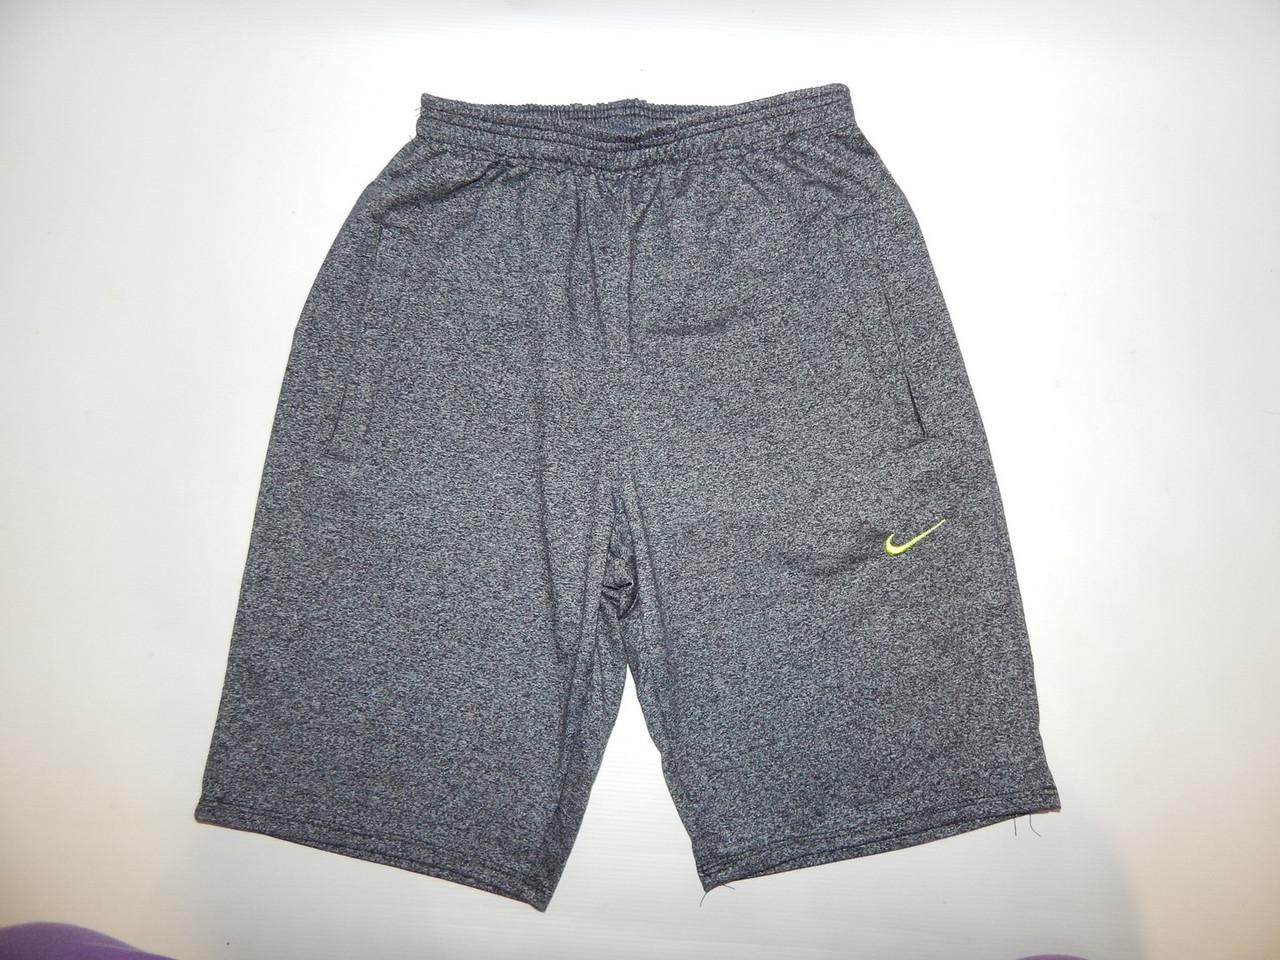 0dc48674 Шорты мужские Nike реплика р.48 039SHM: продажа, цена в Хмельницкой ...